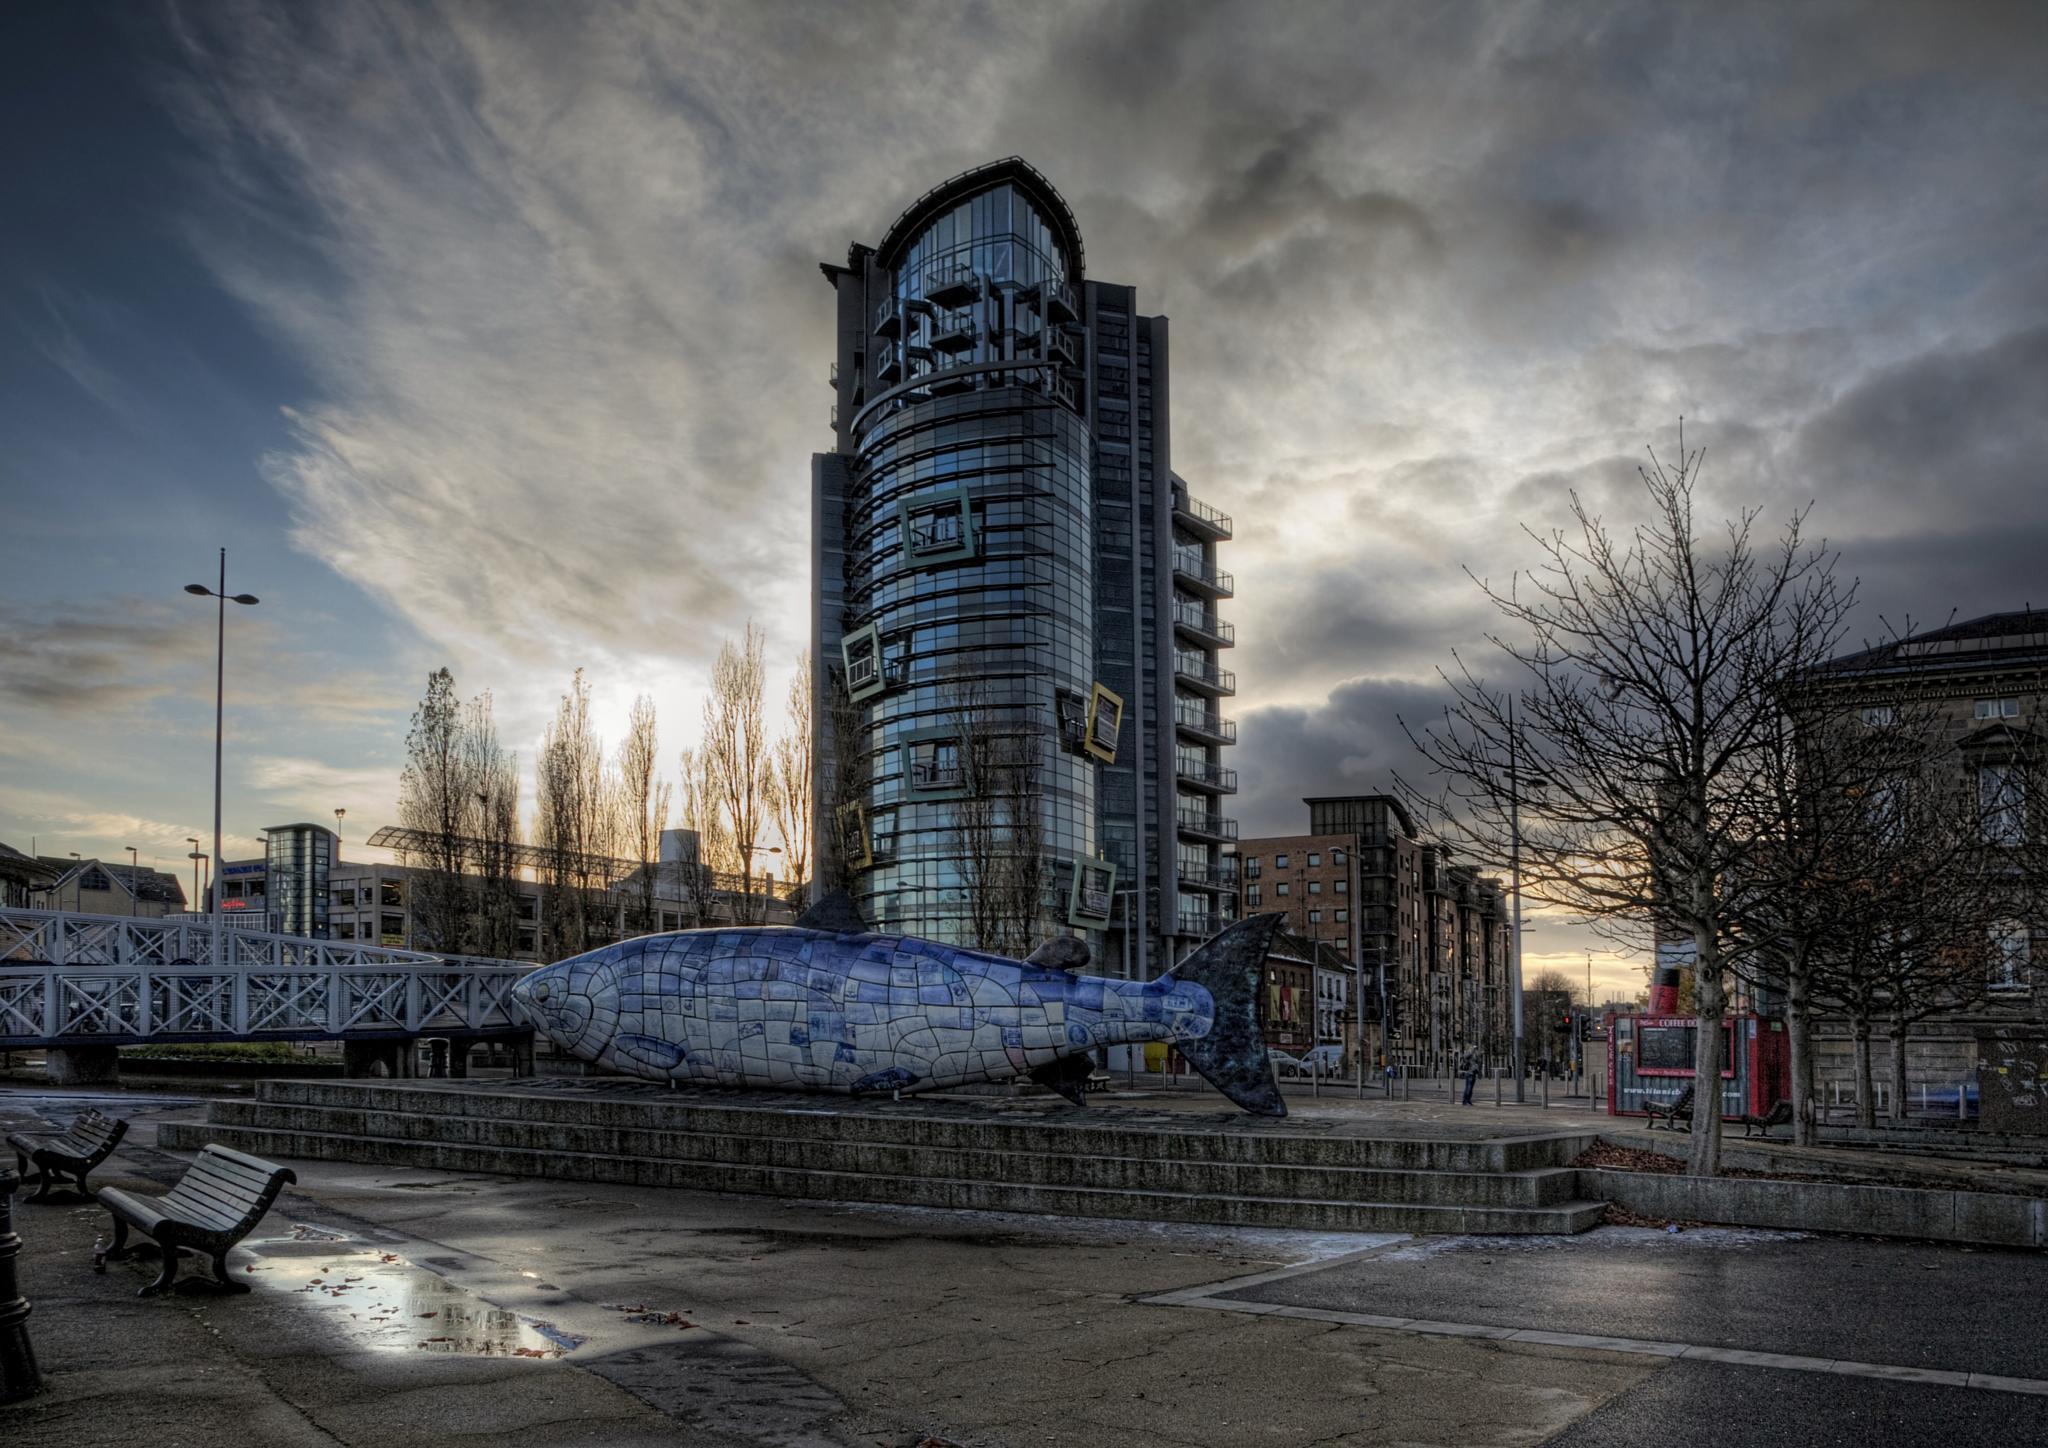 Big Fish by Peter Ellison